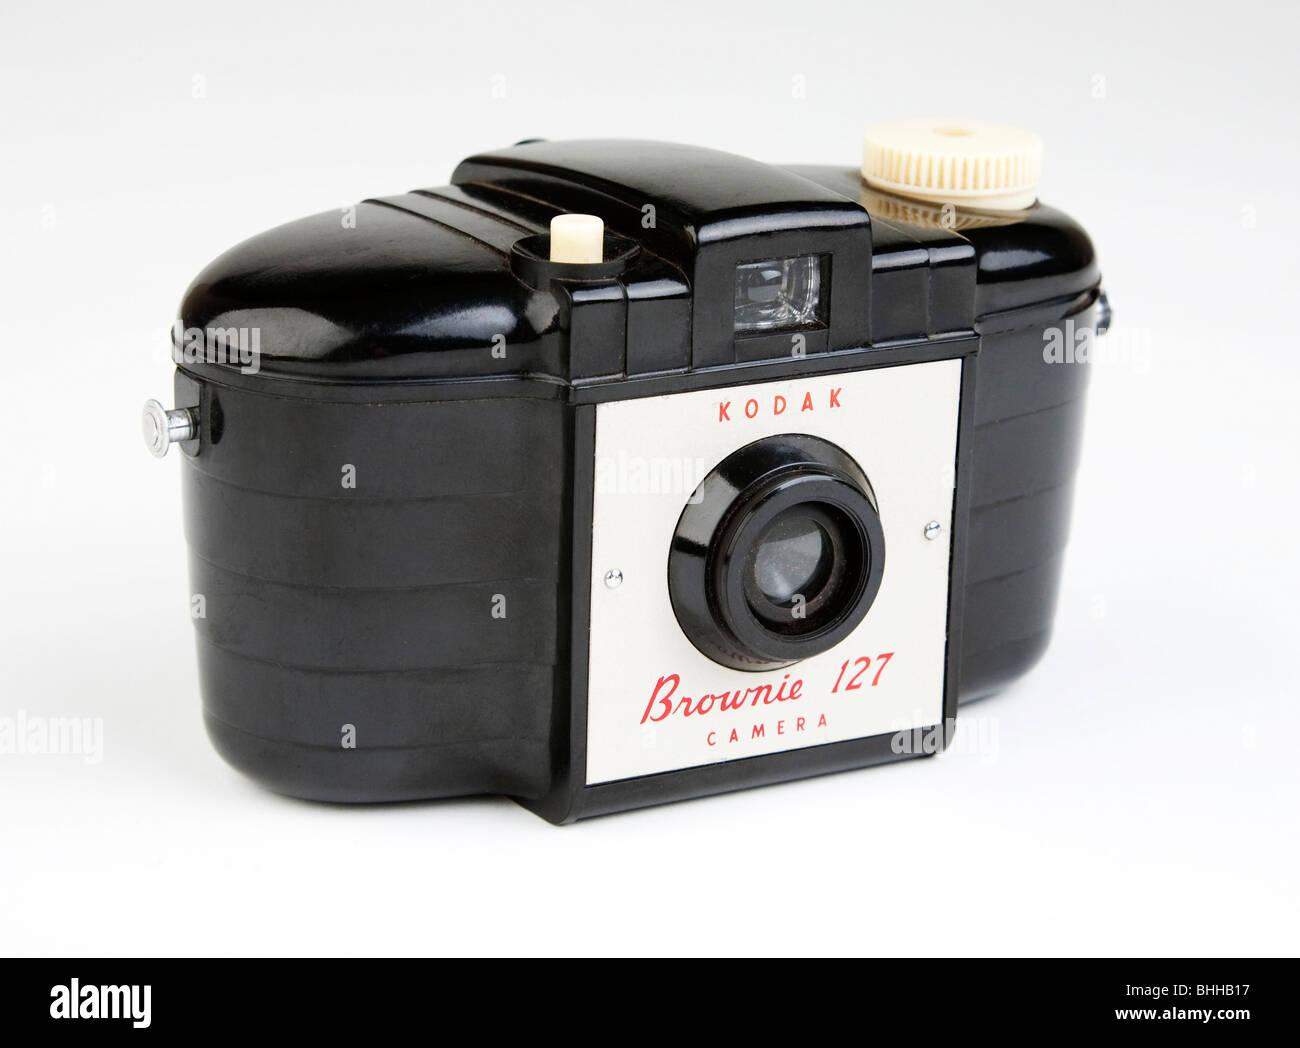 Kodak Brownie camera 1950s classic - Stock Image